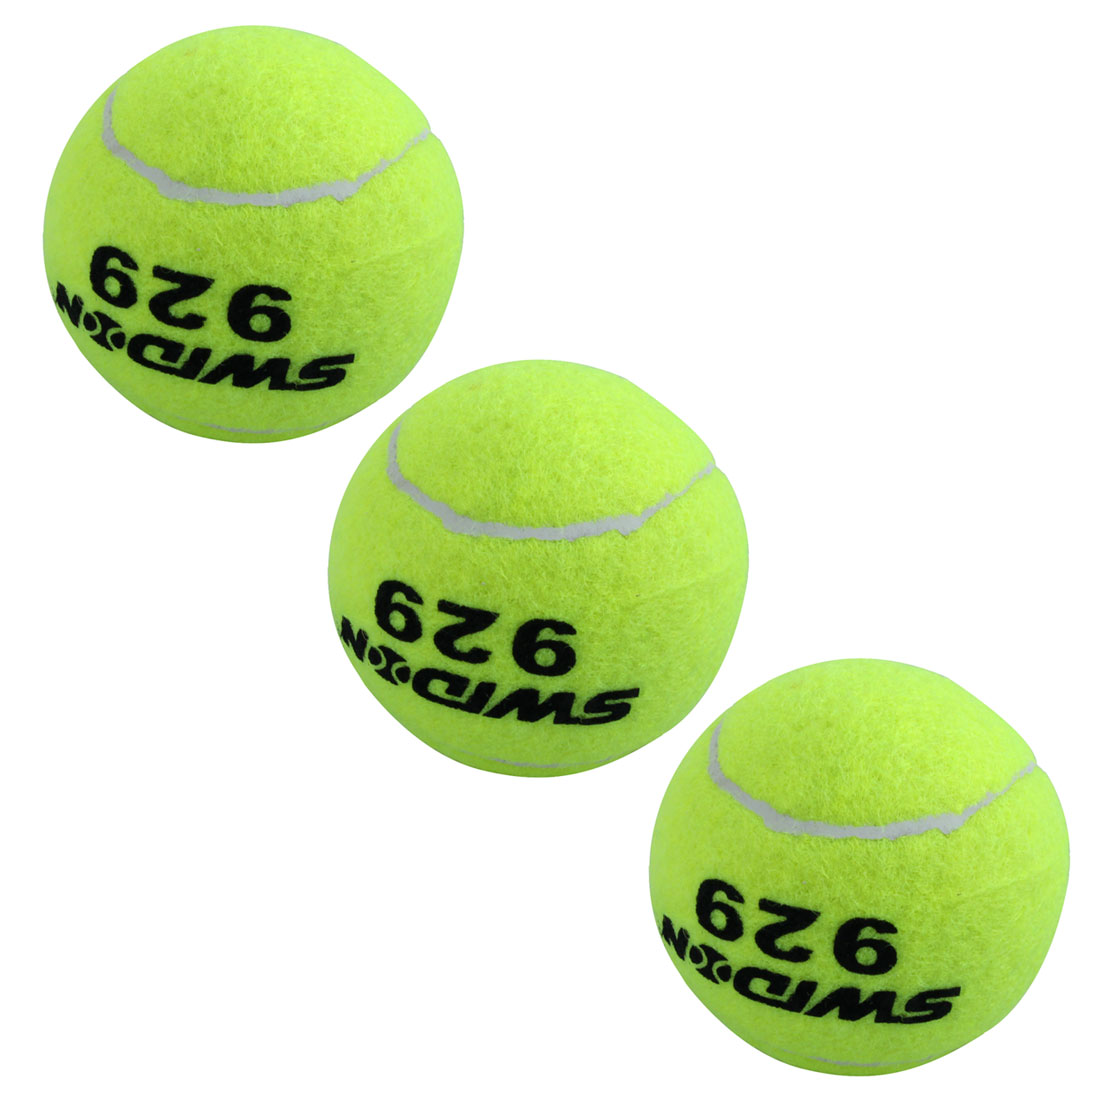 3 Professional Training Sports Tennis Balls Yellow